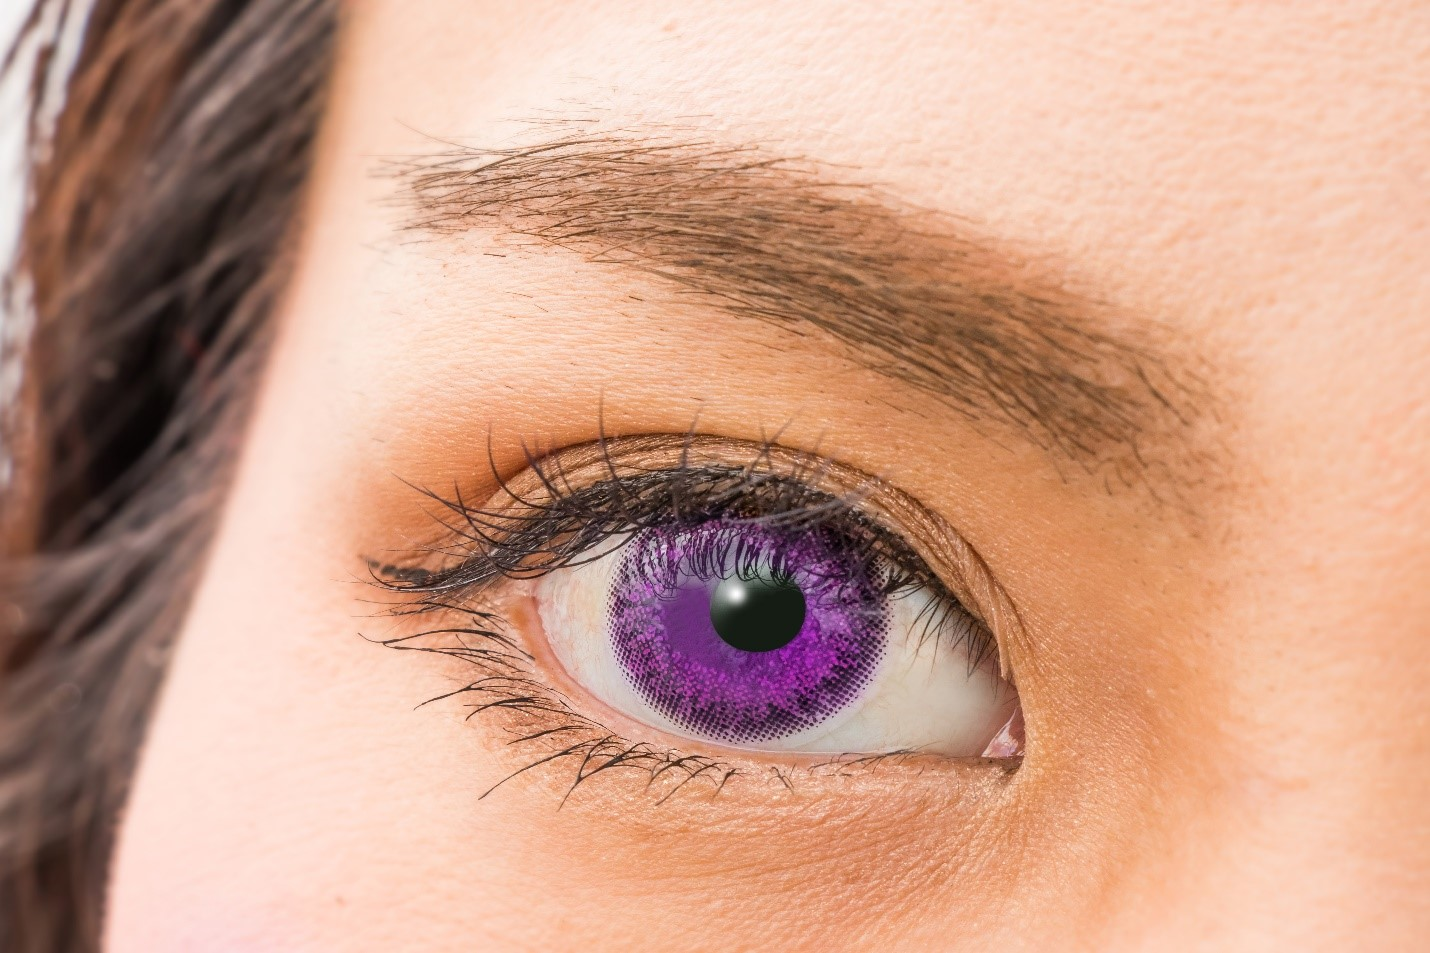 The Risks of Wearing Non-Prescription Decorative Contact Lenses